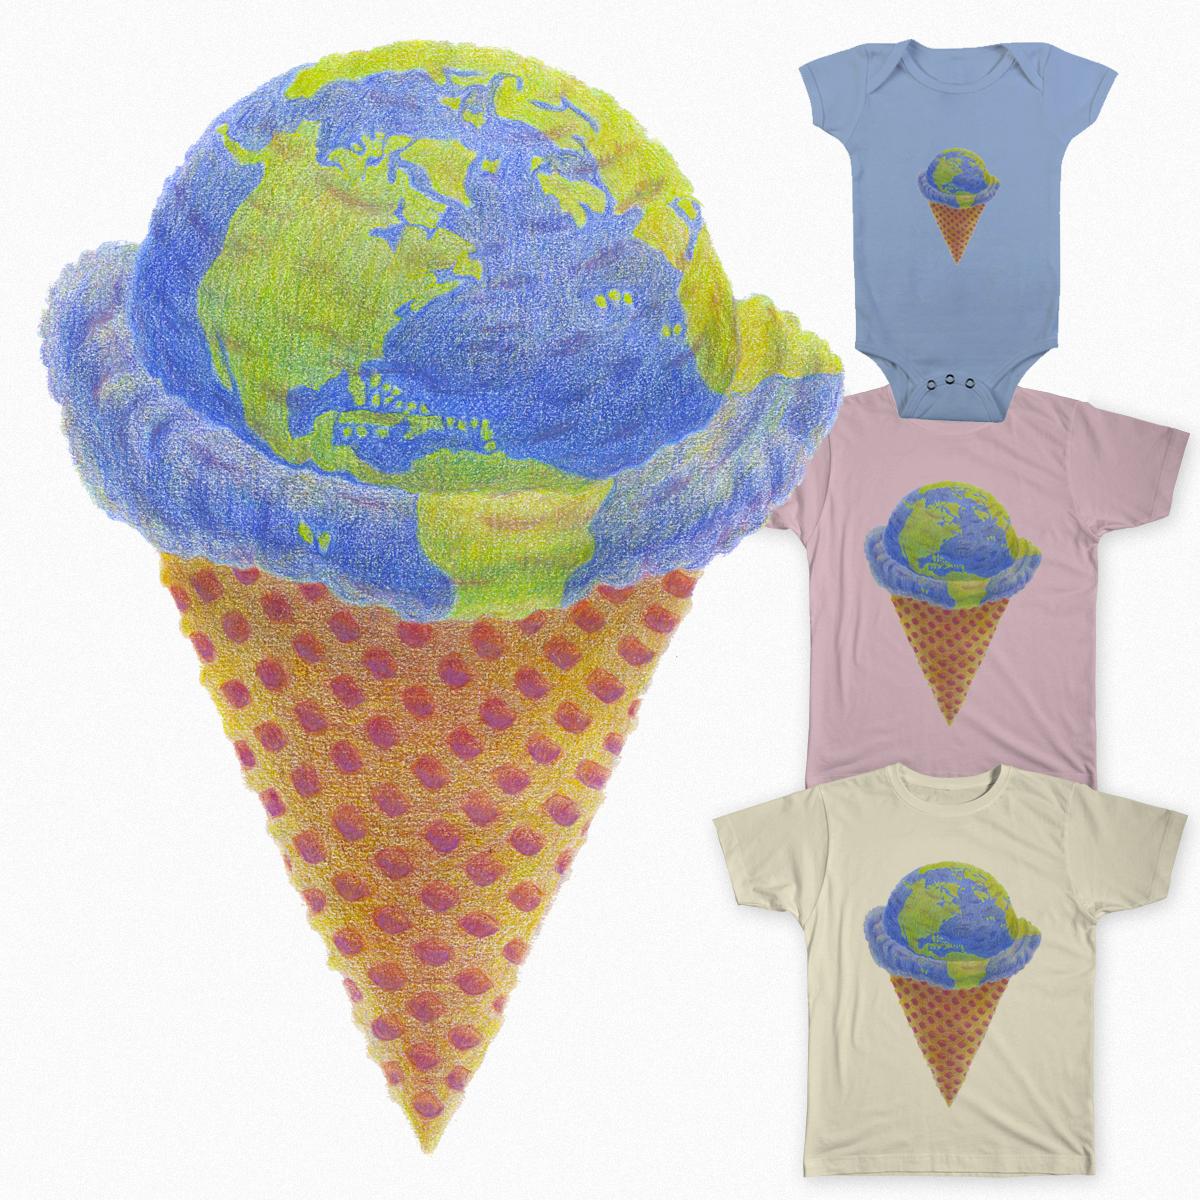 Earth Cream by mintkirai on Threadless